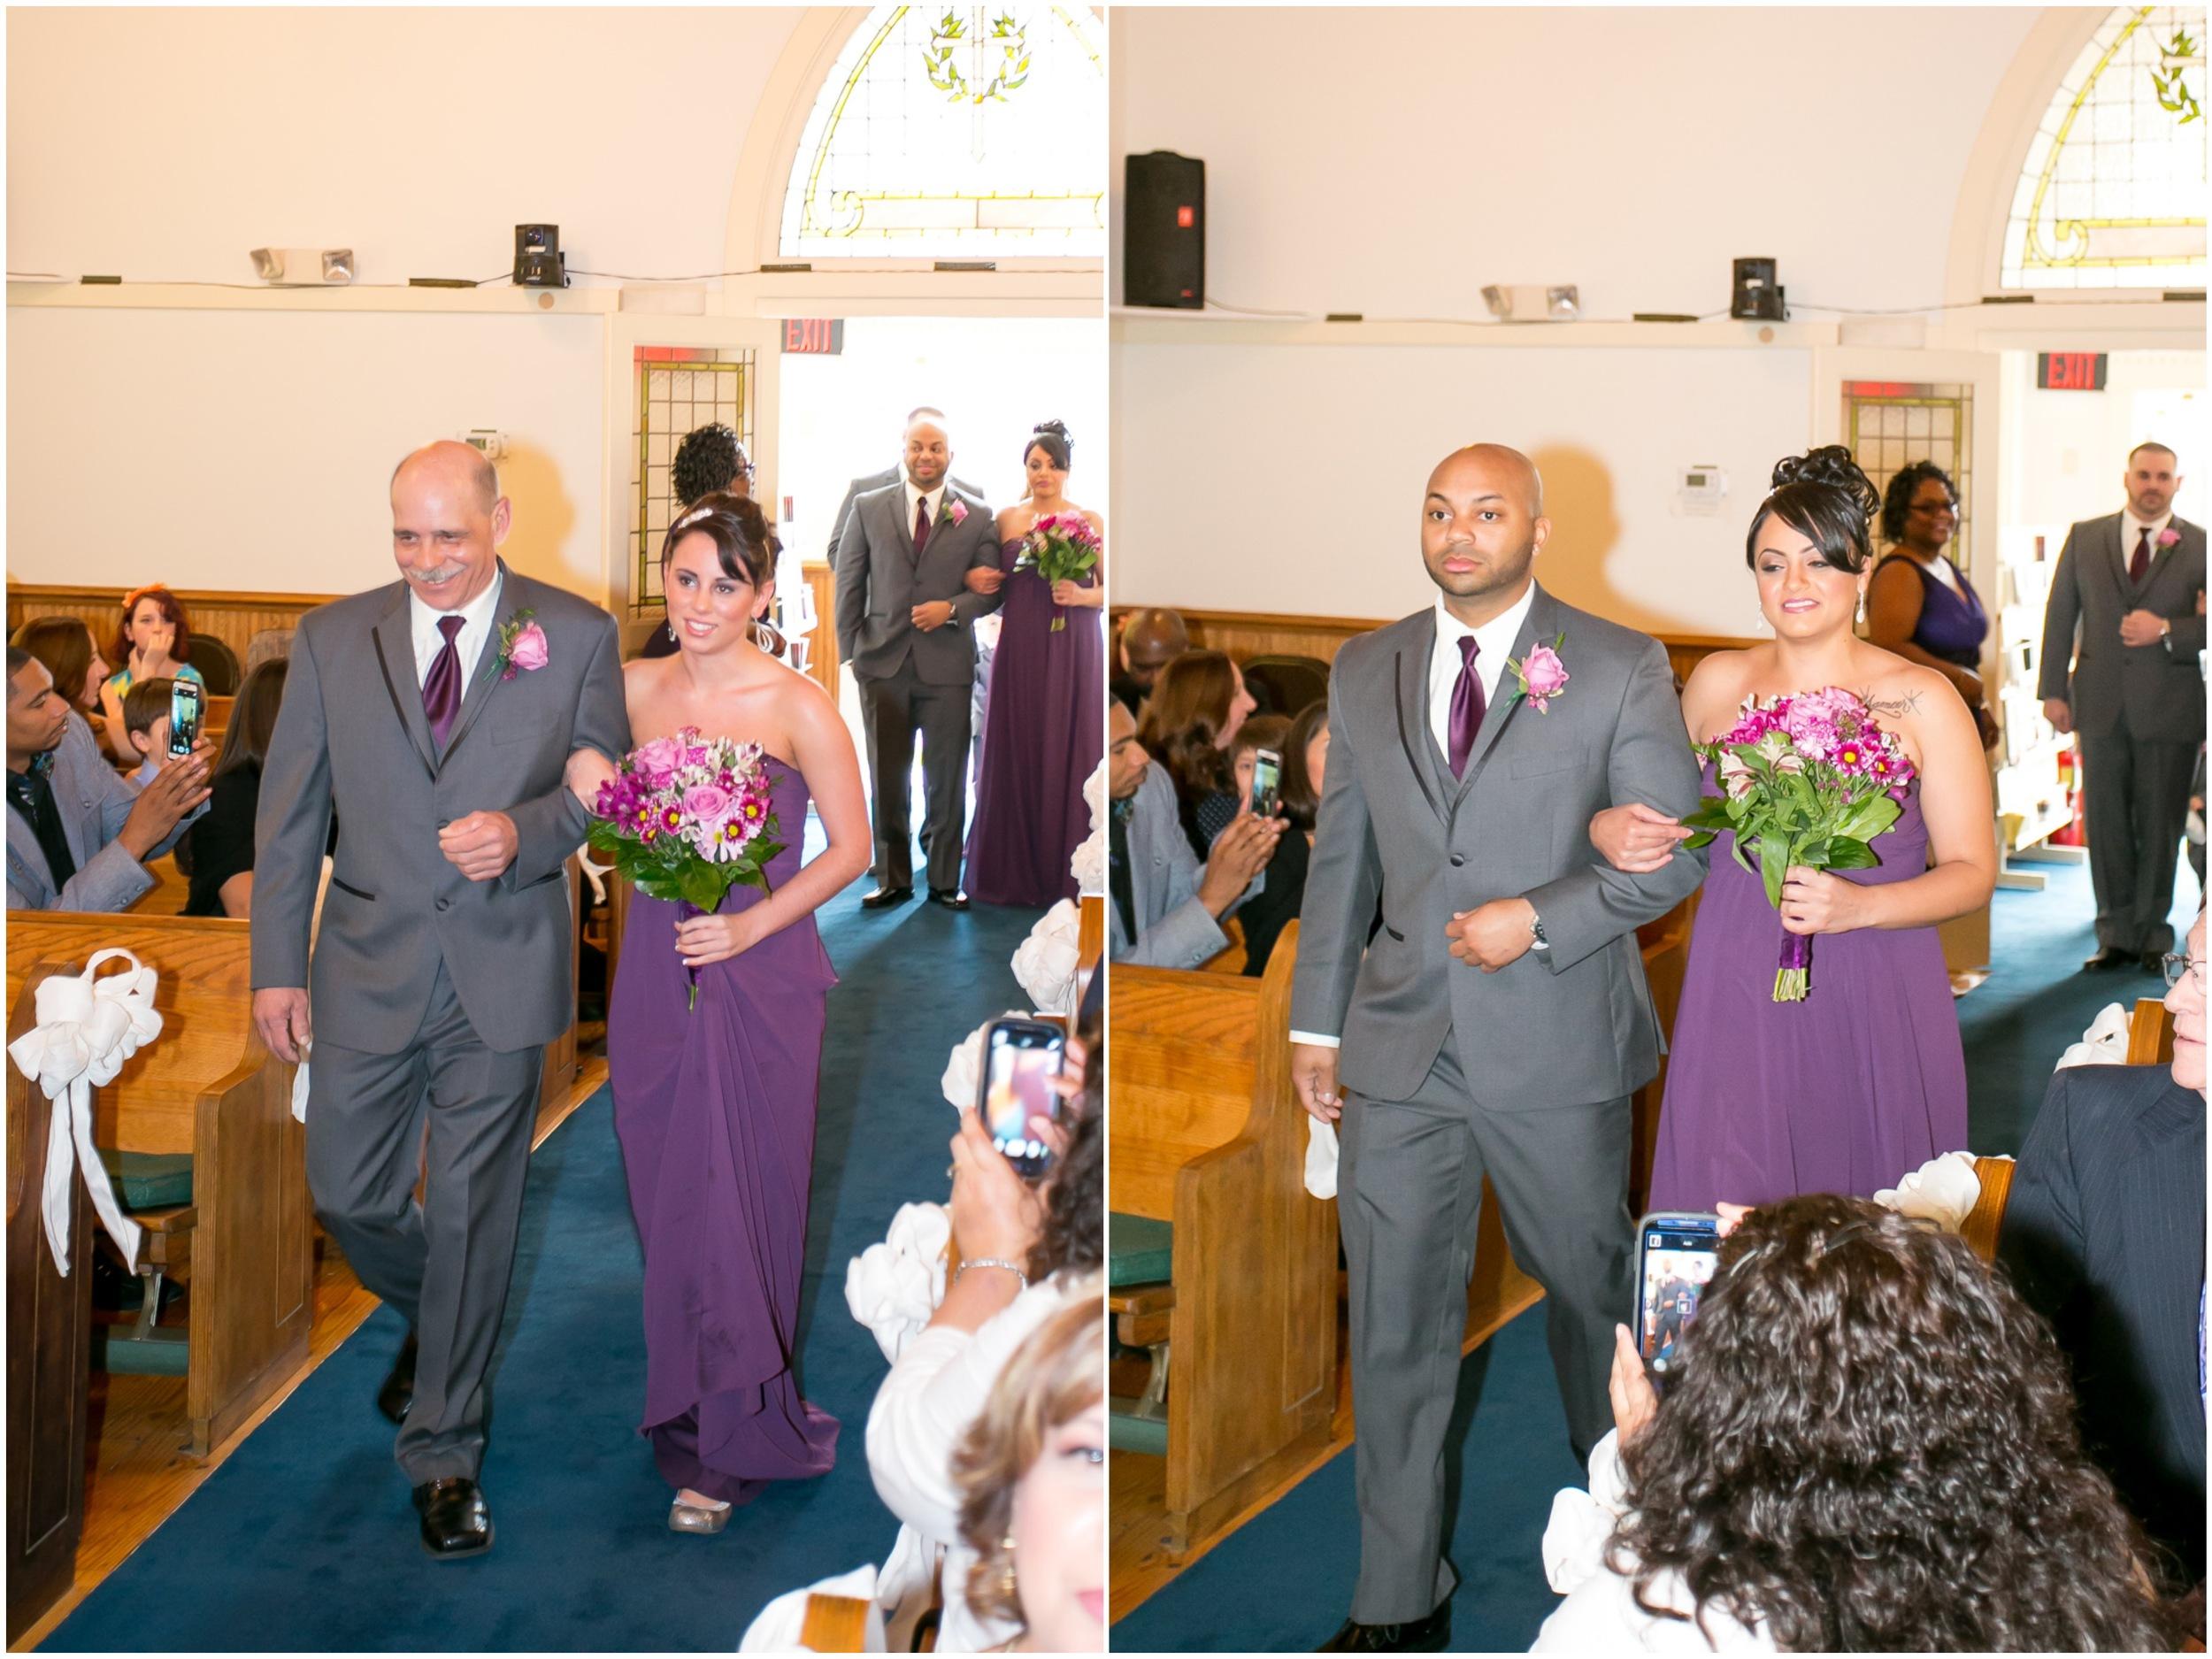 Bradly-and-Jesenia-Wedding-Collage-15.jpg